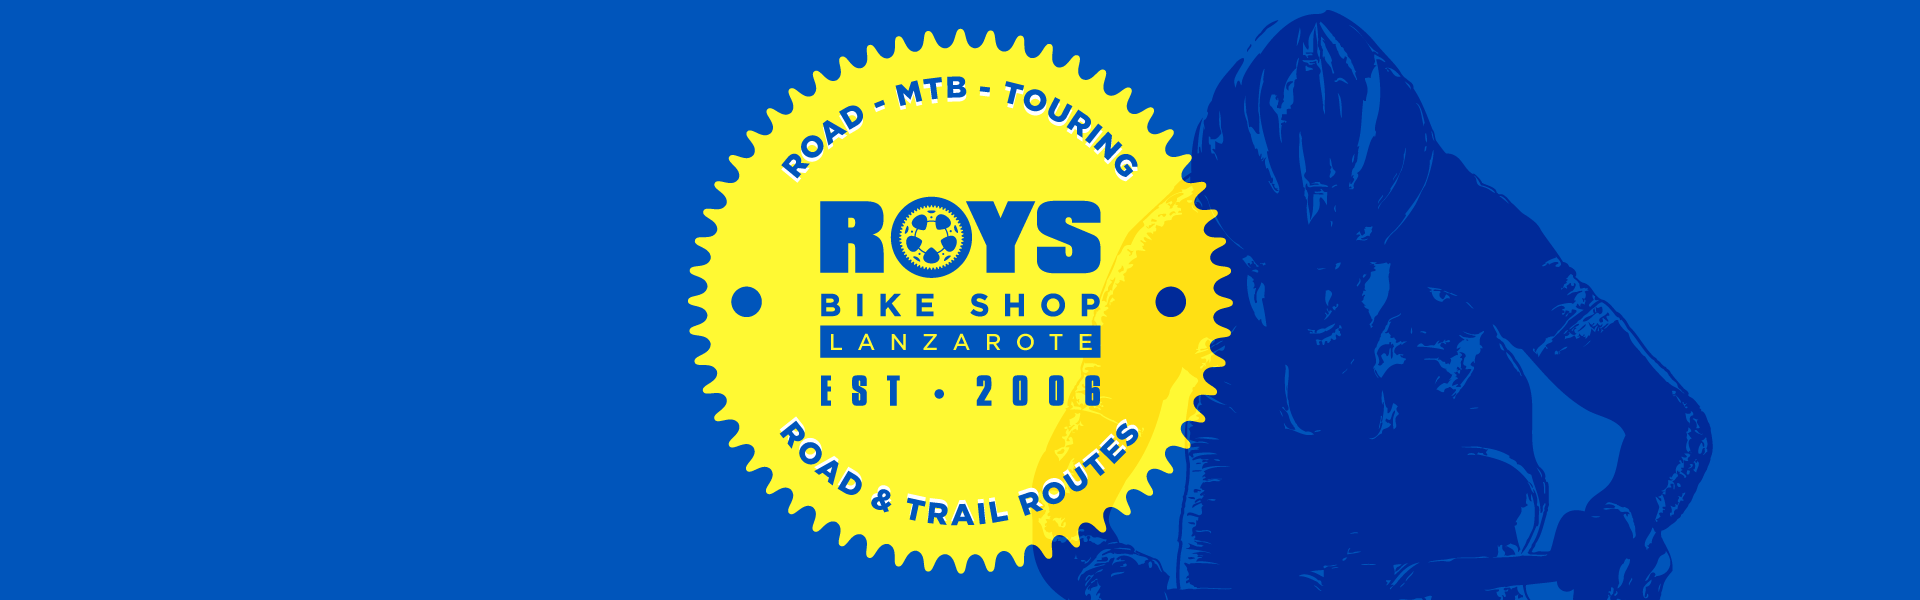 Roys-Bike-Shop-Lanzarote-Playa-Blanca